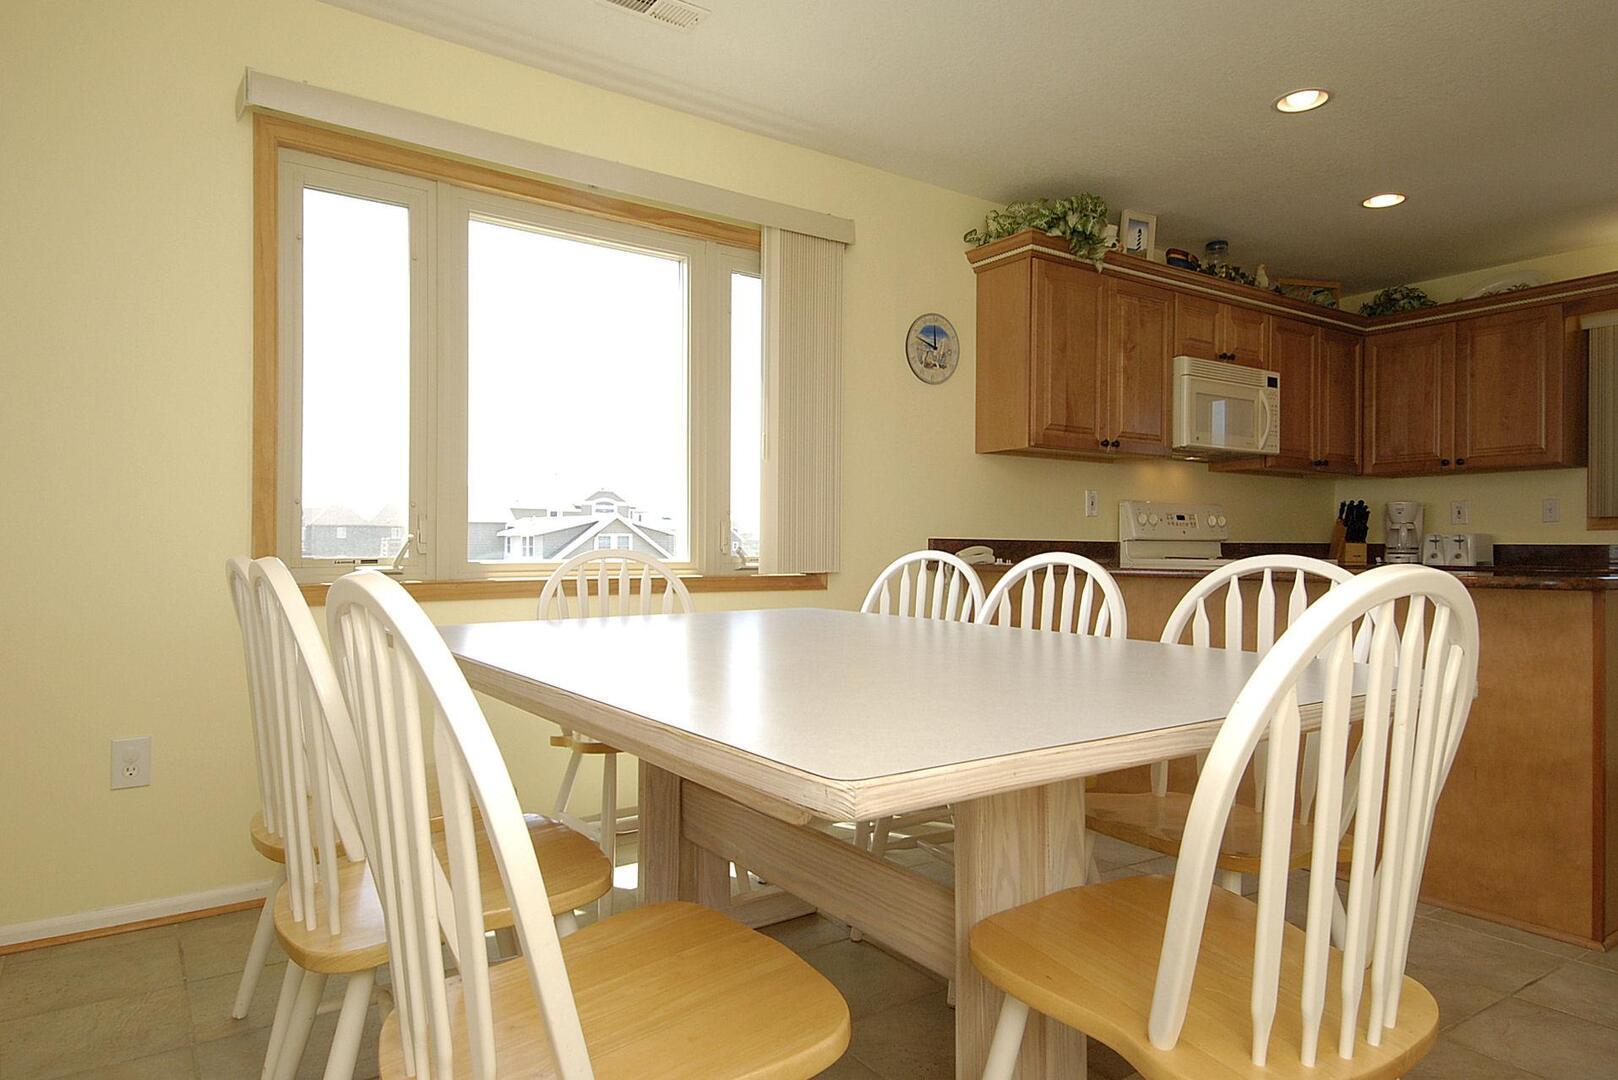 Main Level,Dining Area,